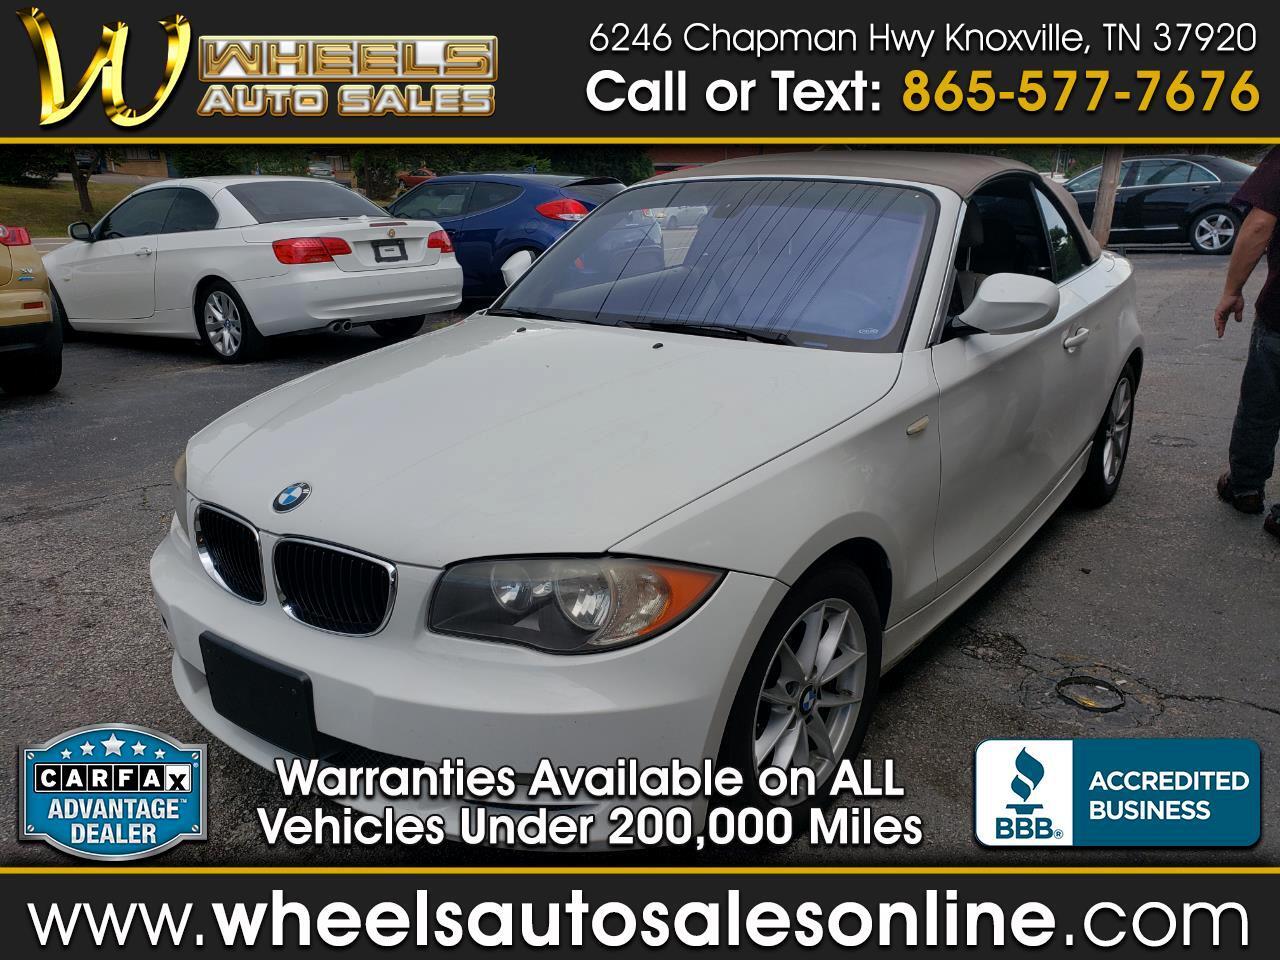 2011 BMW 1 Series 2dr Conv 128i